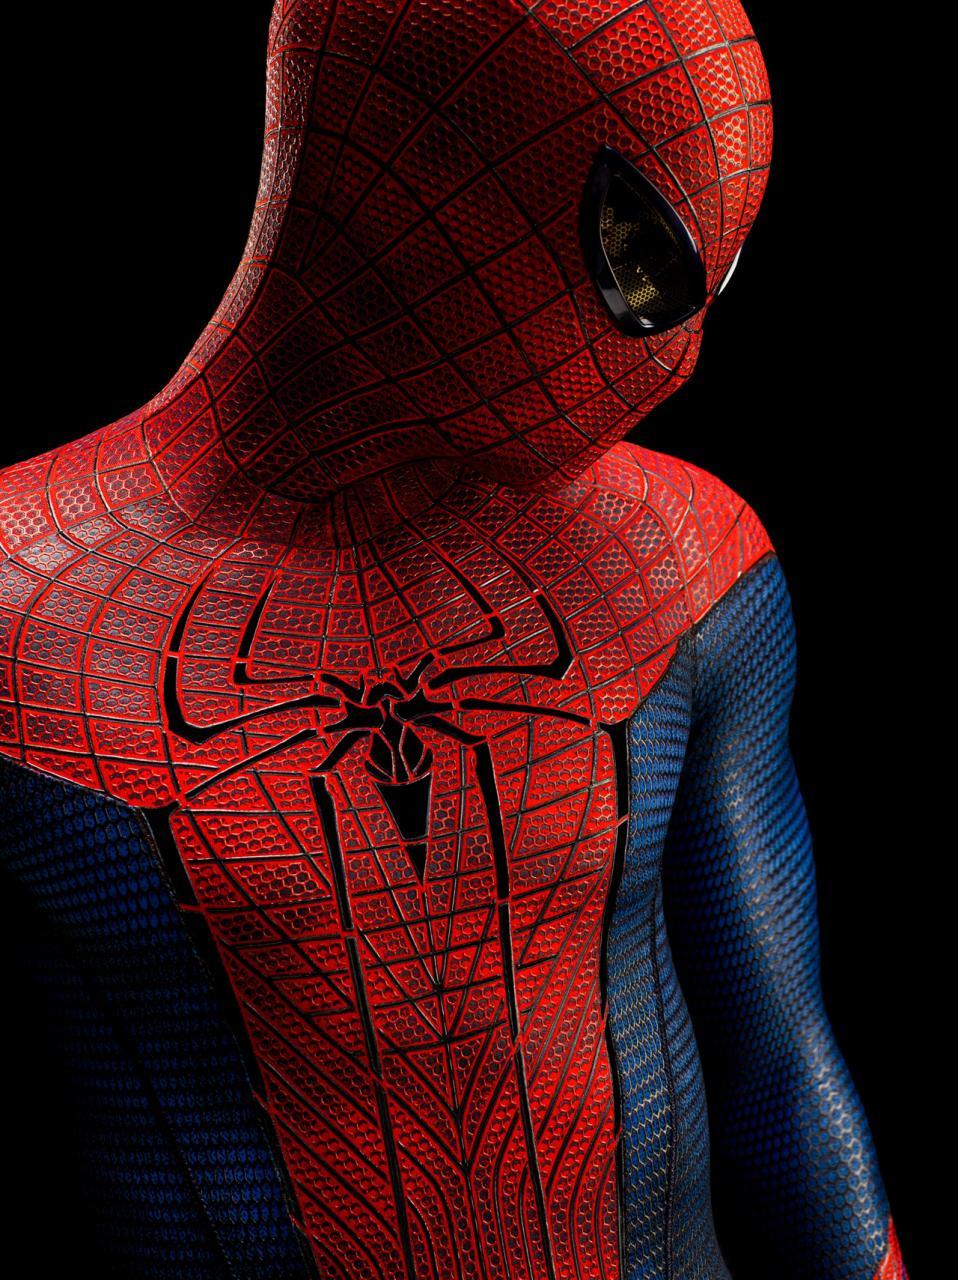 http://collider.com/wp-content/uploads/amazing-spider-man-andrew-garfield-hi-res-02.jpg